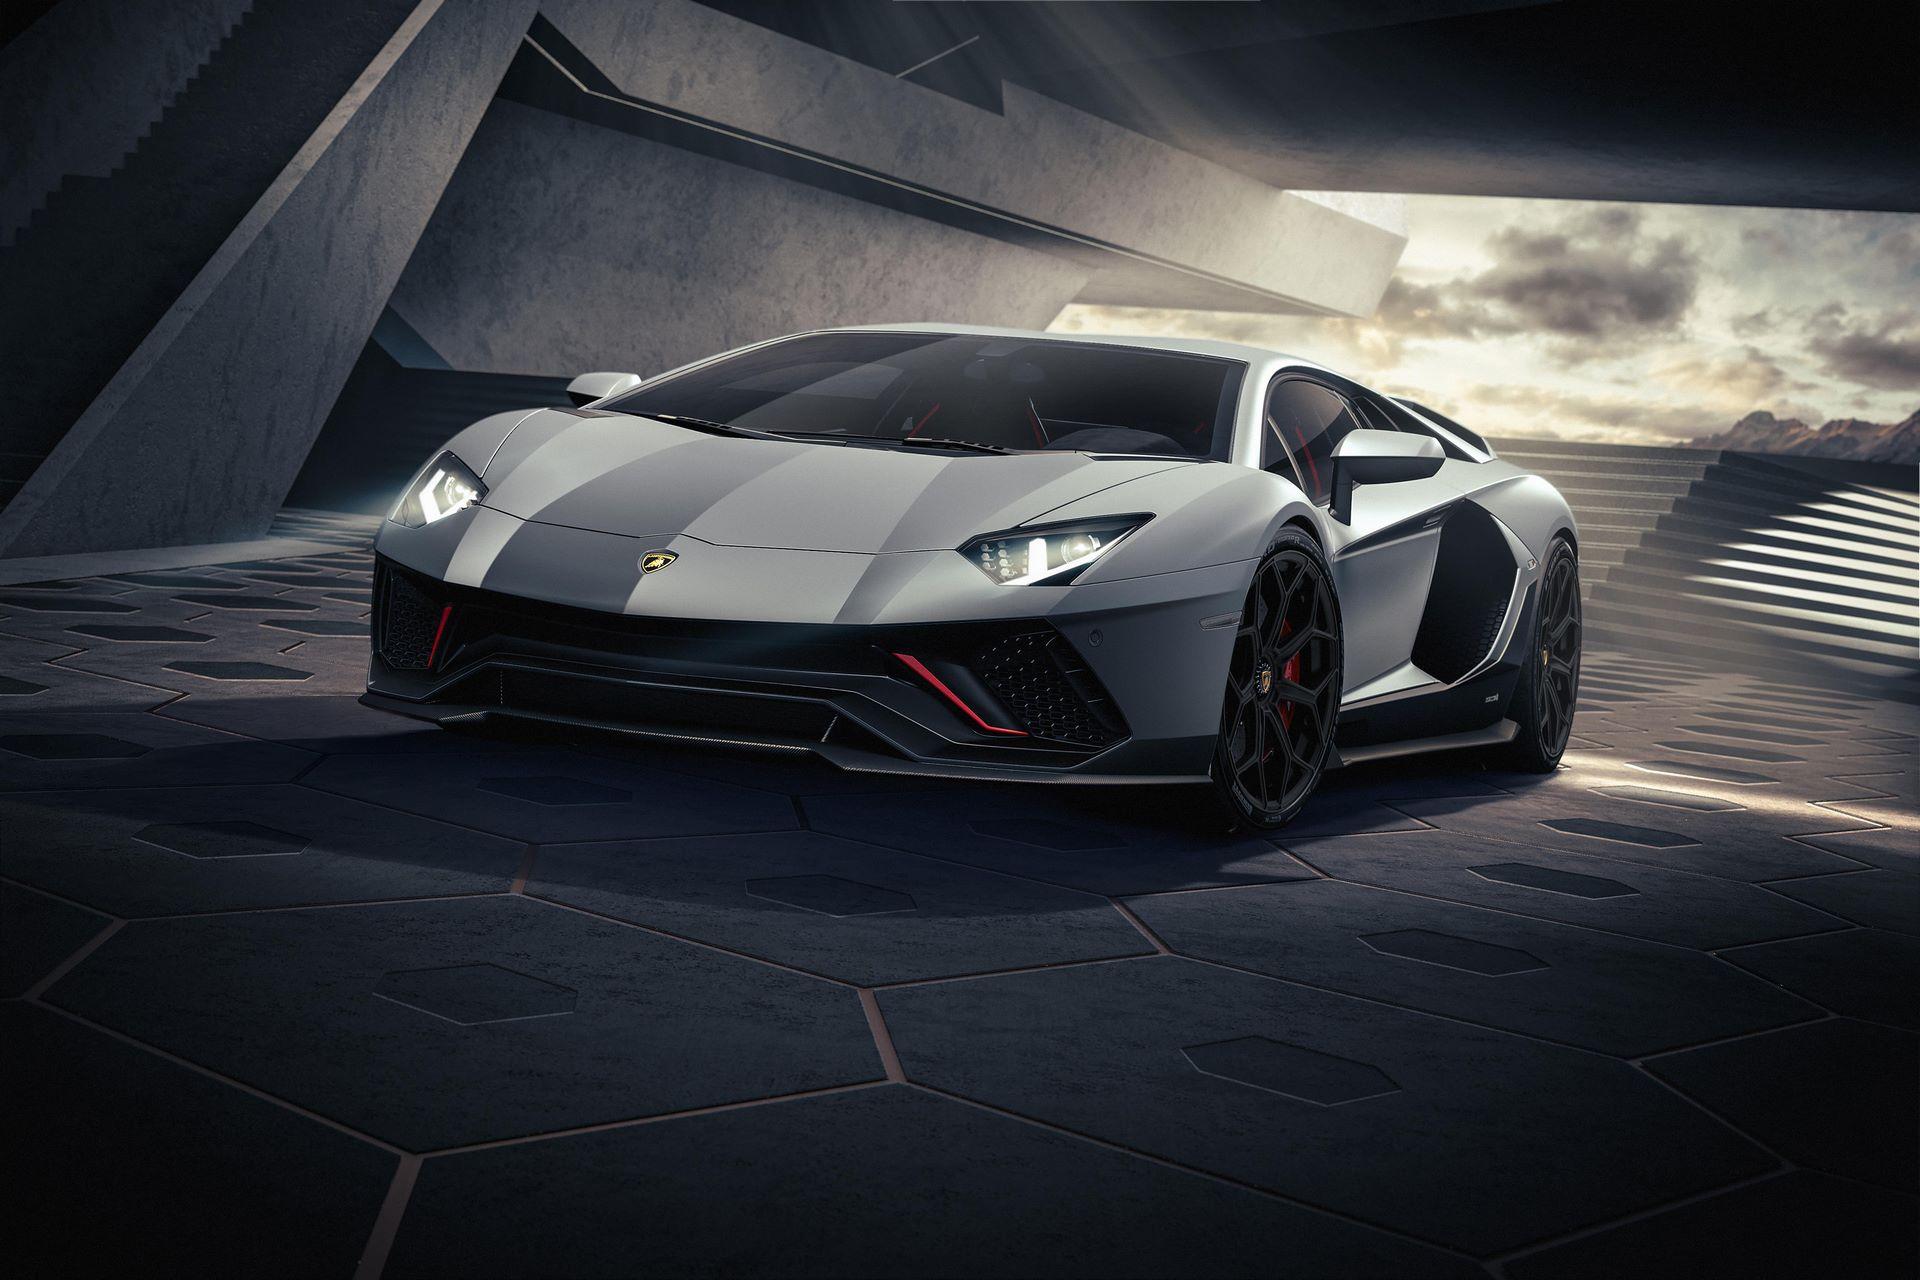 Lamborghini-Aventador-LP780-4-Ultimae-15